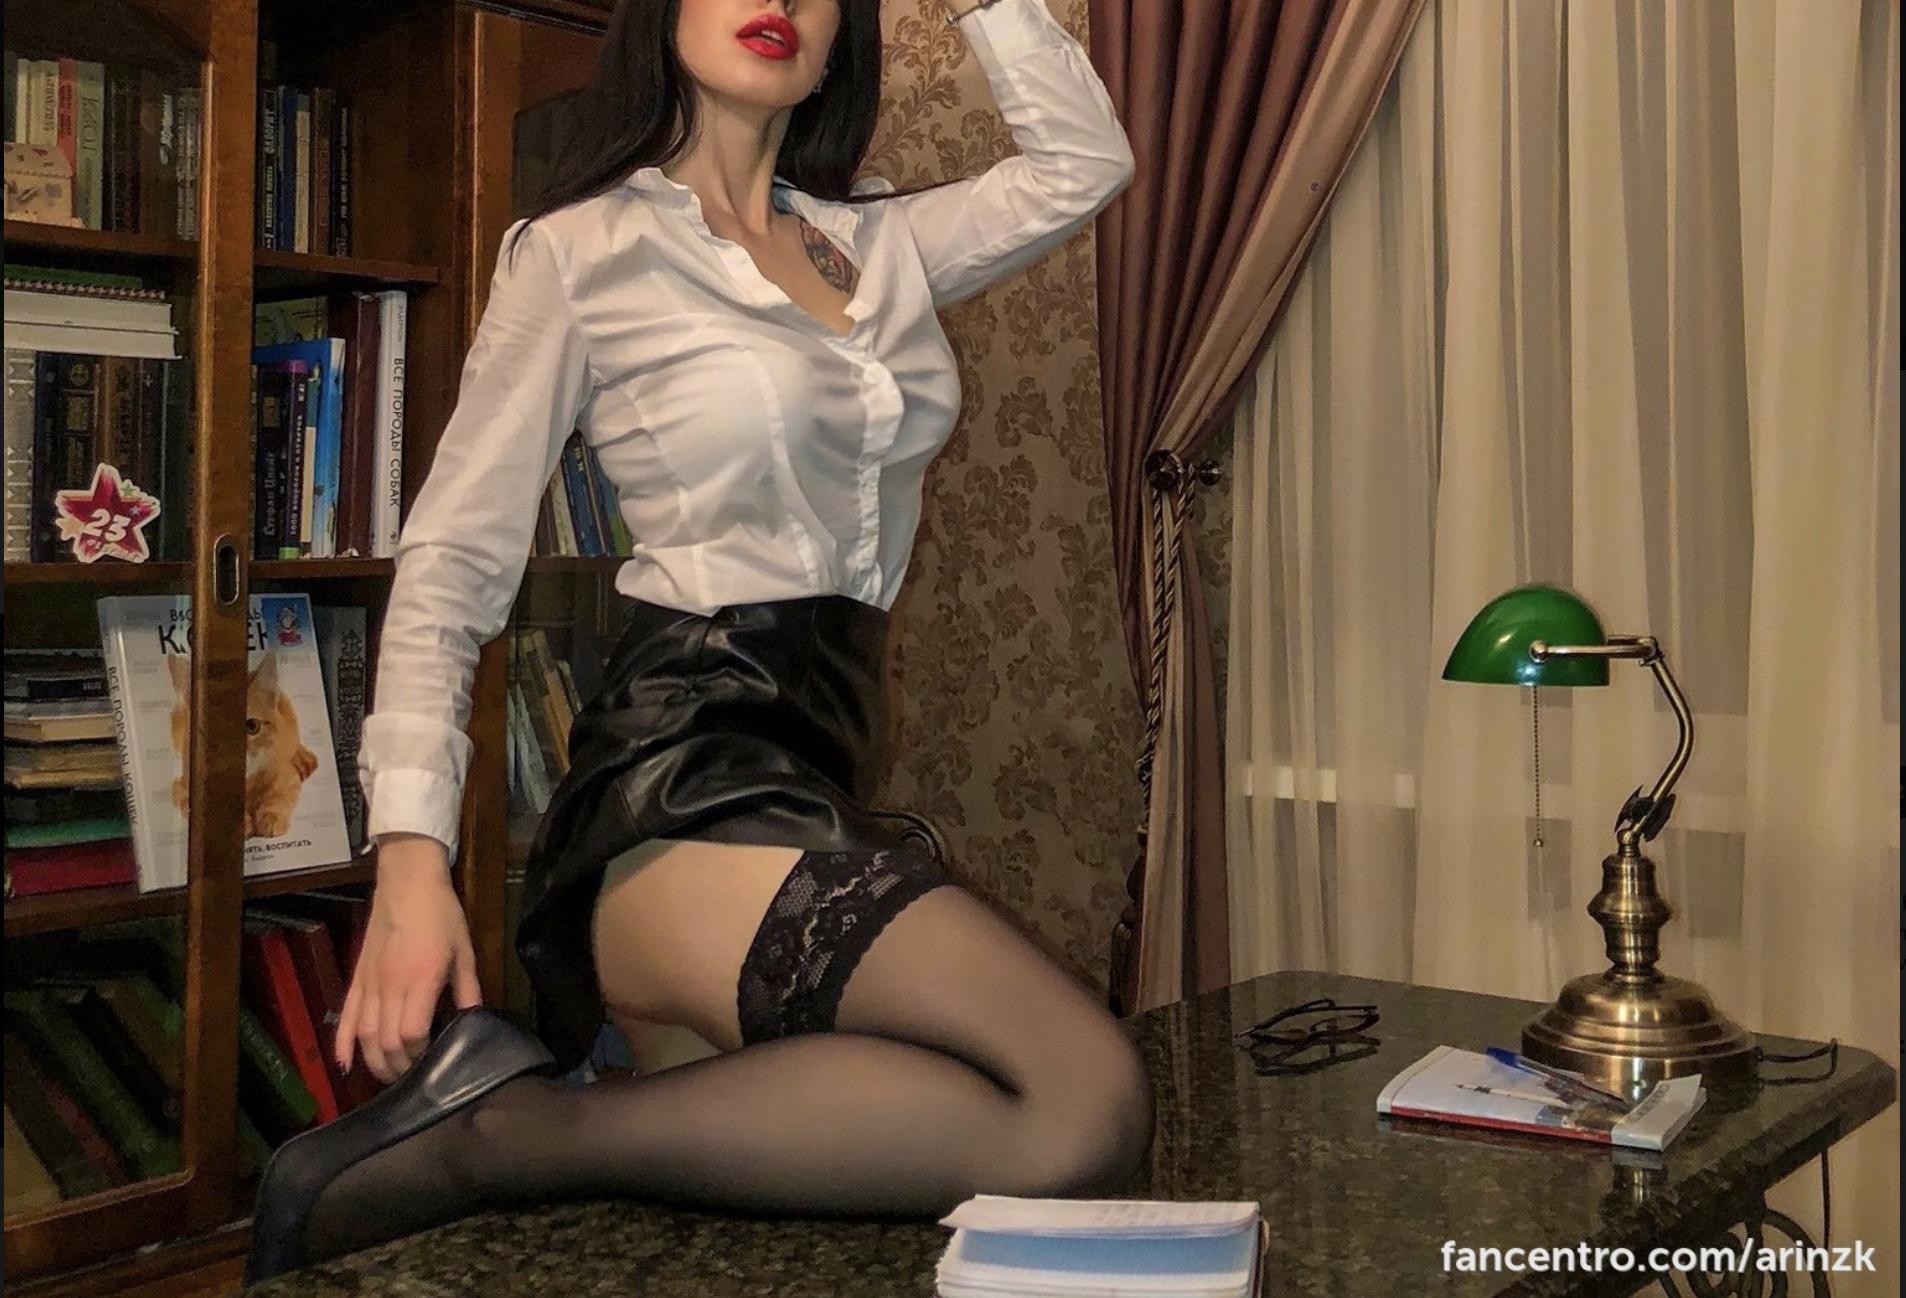 Arinzk Big Tit Queen of Dirty Talk